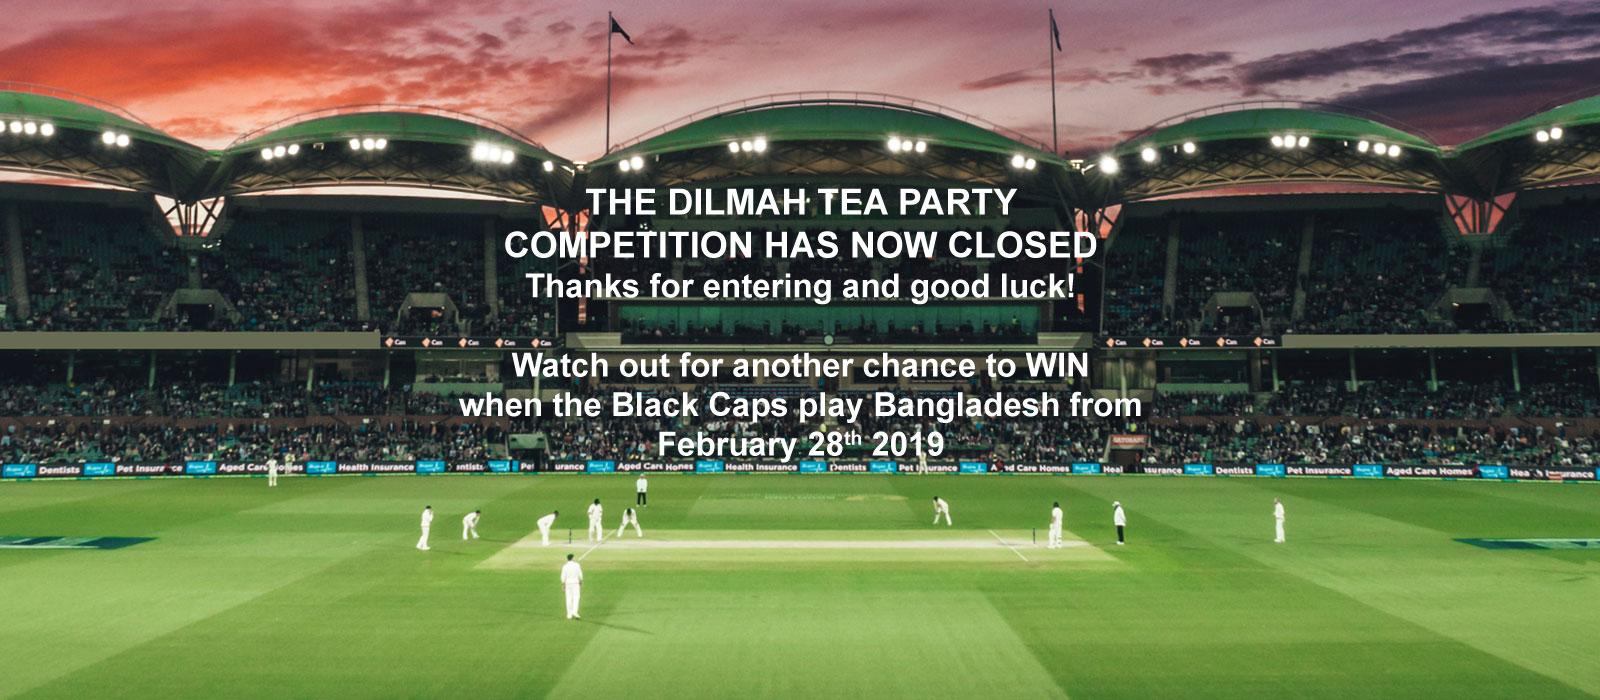 Dilmah Tea Party